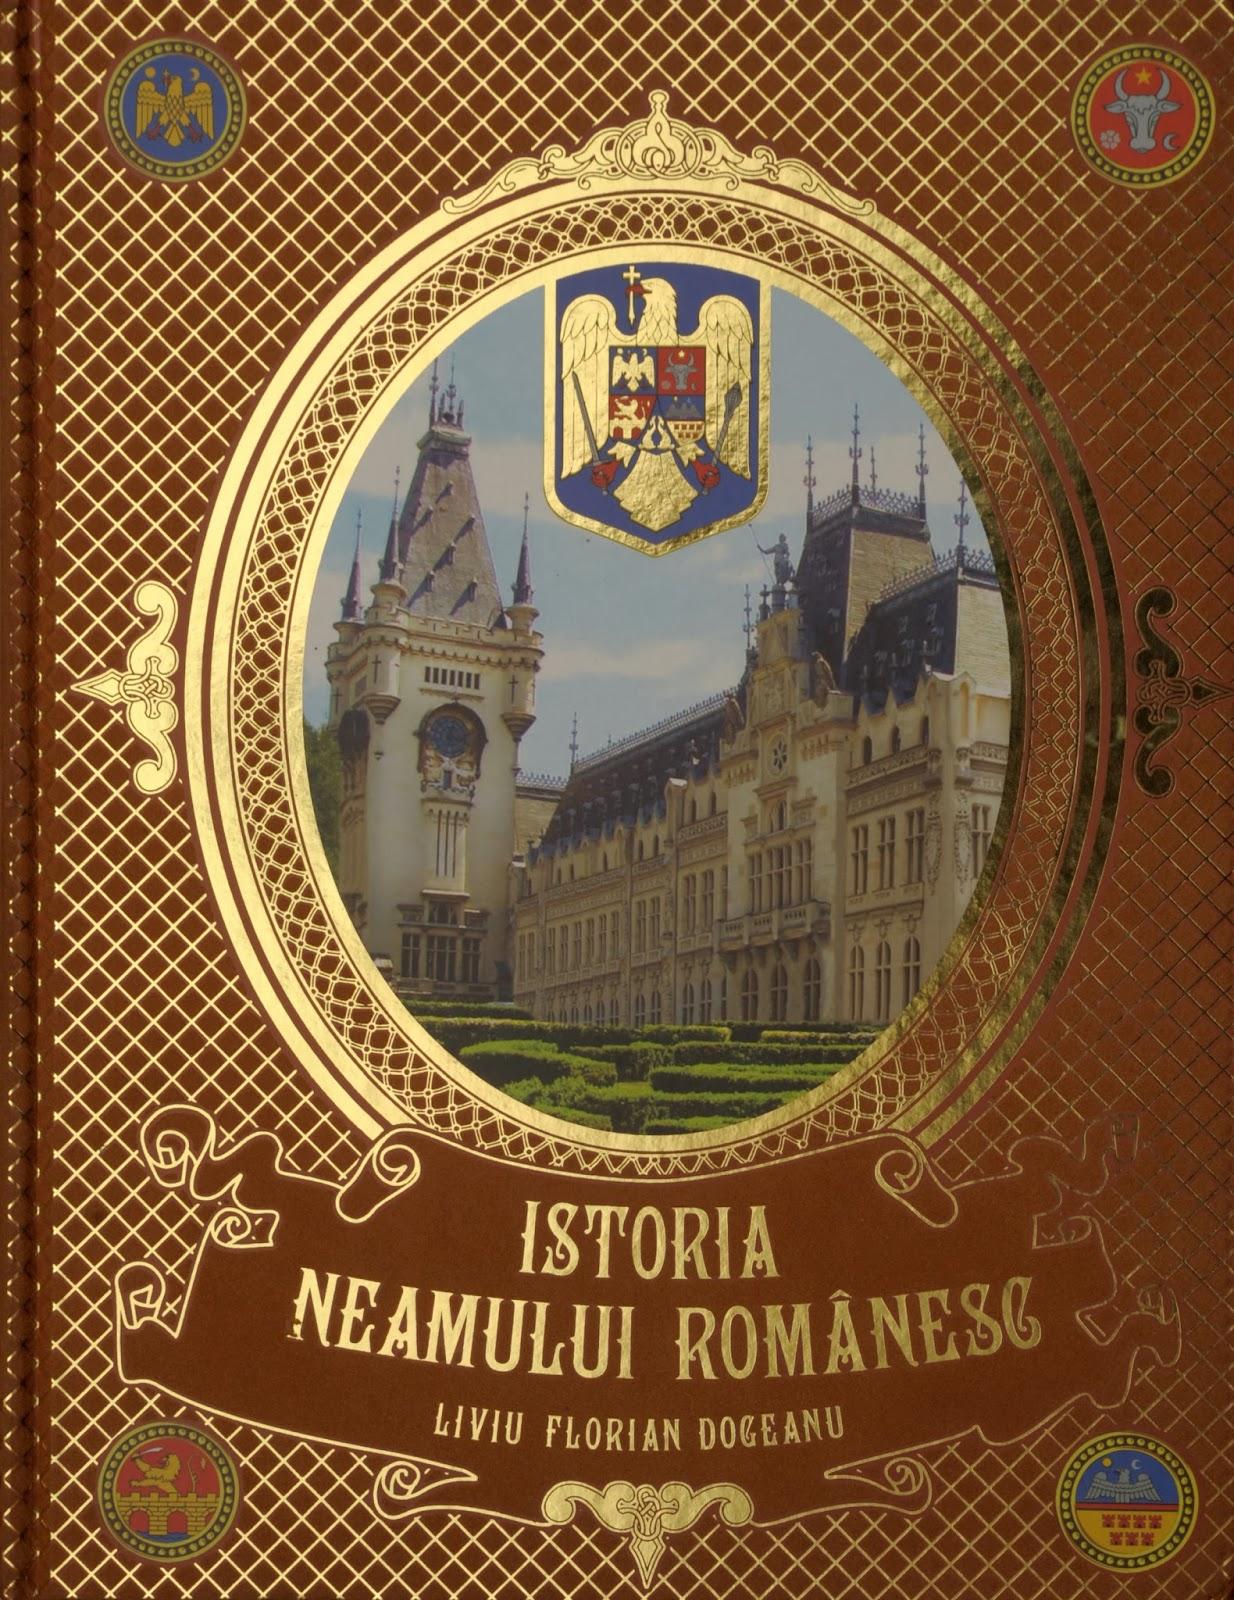 Istoria neamului romanesc - coperta fata